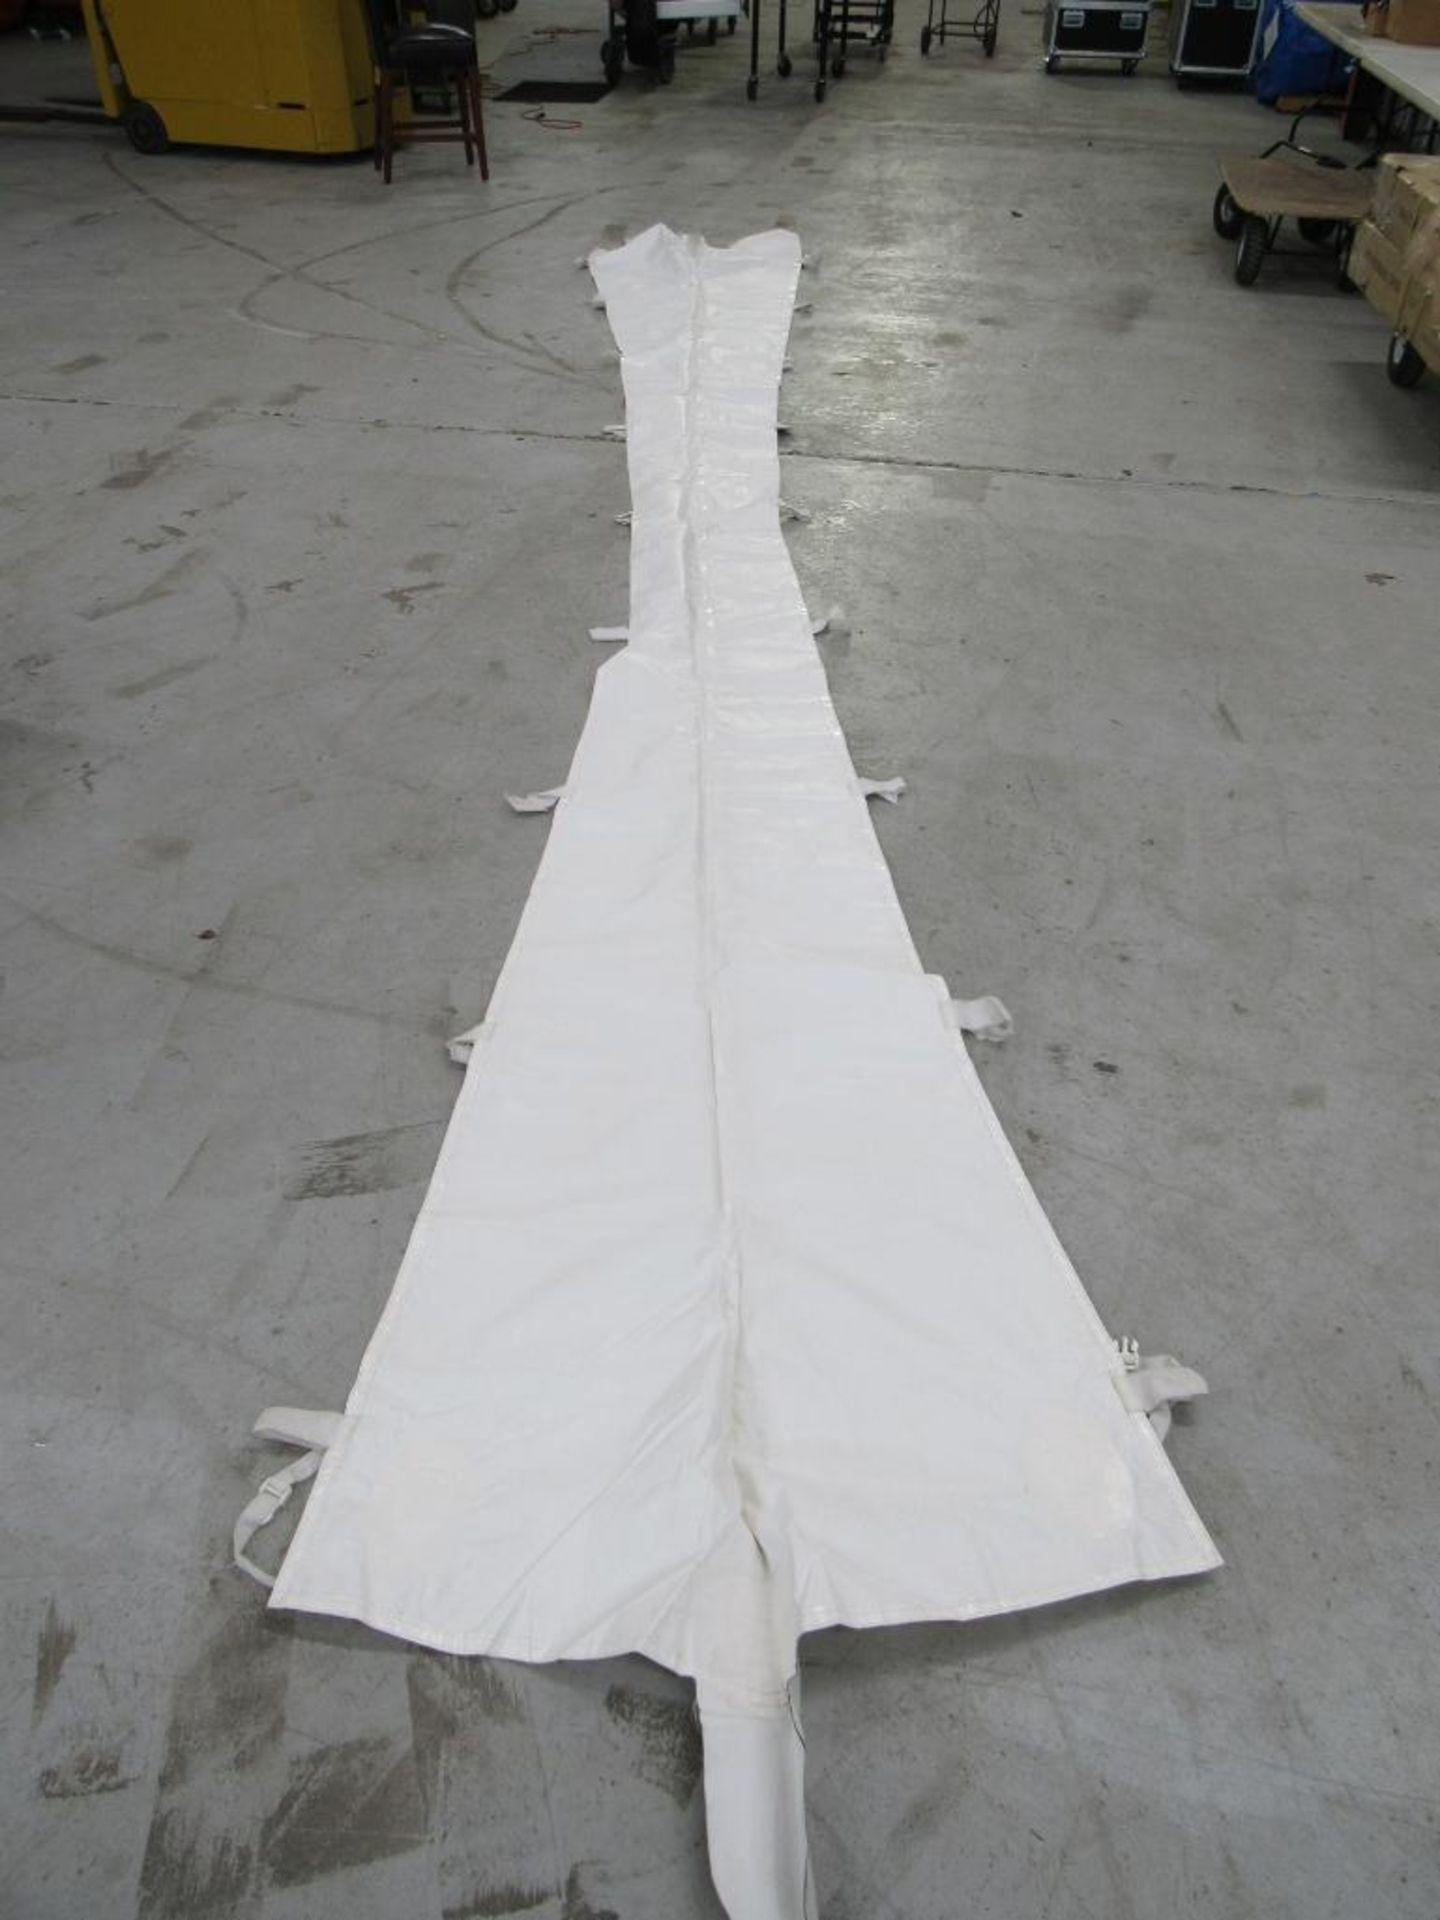 Lot 69 - PINNACLE Rain Gutters, 20 ft. Tent (2) Pieces